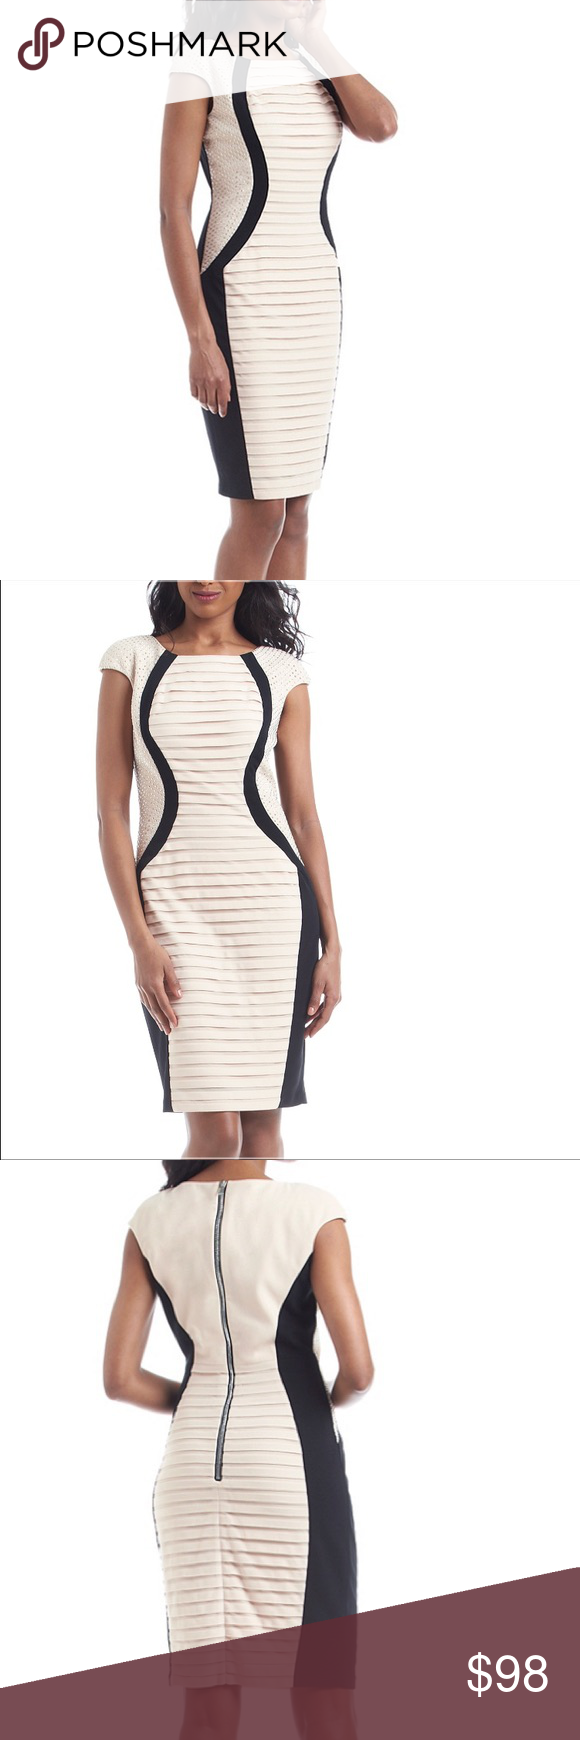 Black Cream Studded Sides Dress Sleek Fashion Fashion Clothes Design [ 1740 x 580 Pixel ]